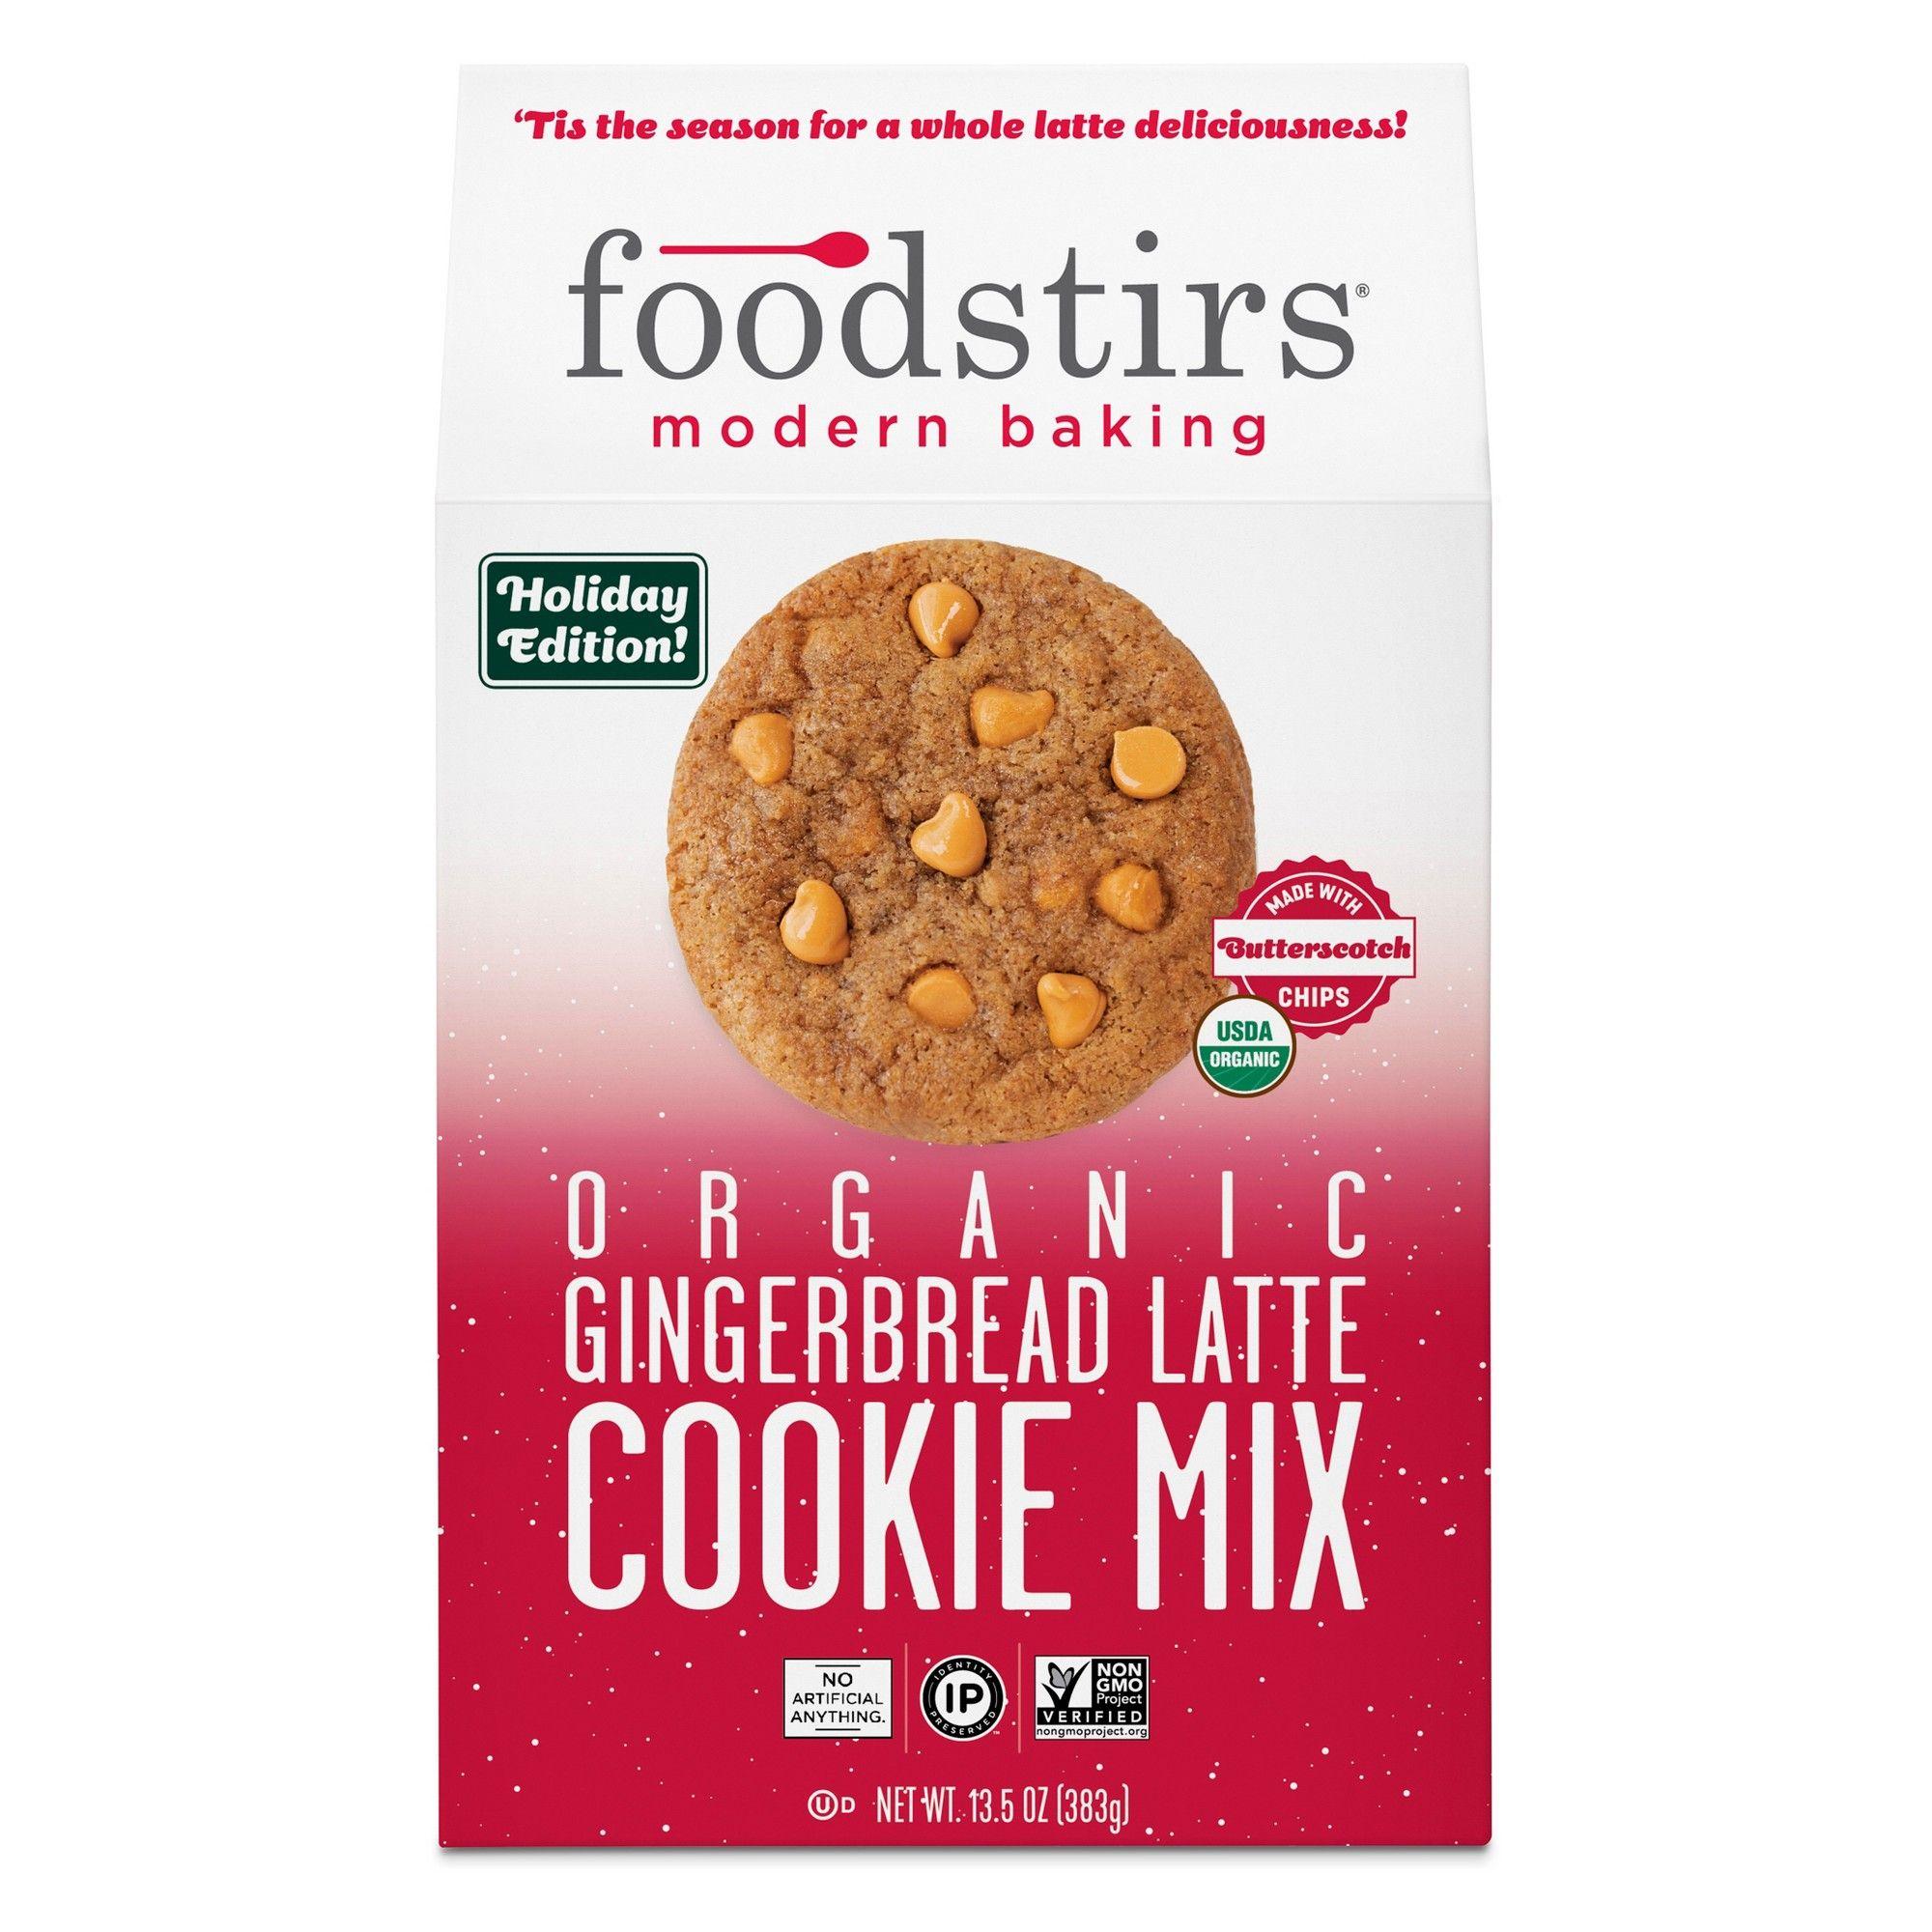 Foodstirs Organic Gingerbread Latte Cookie Mix